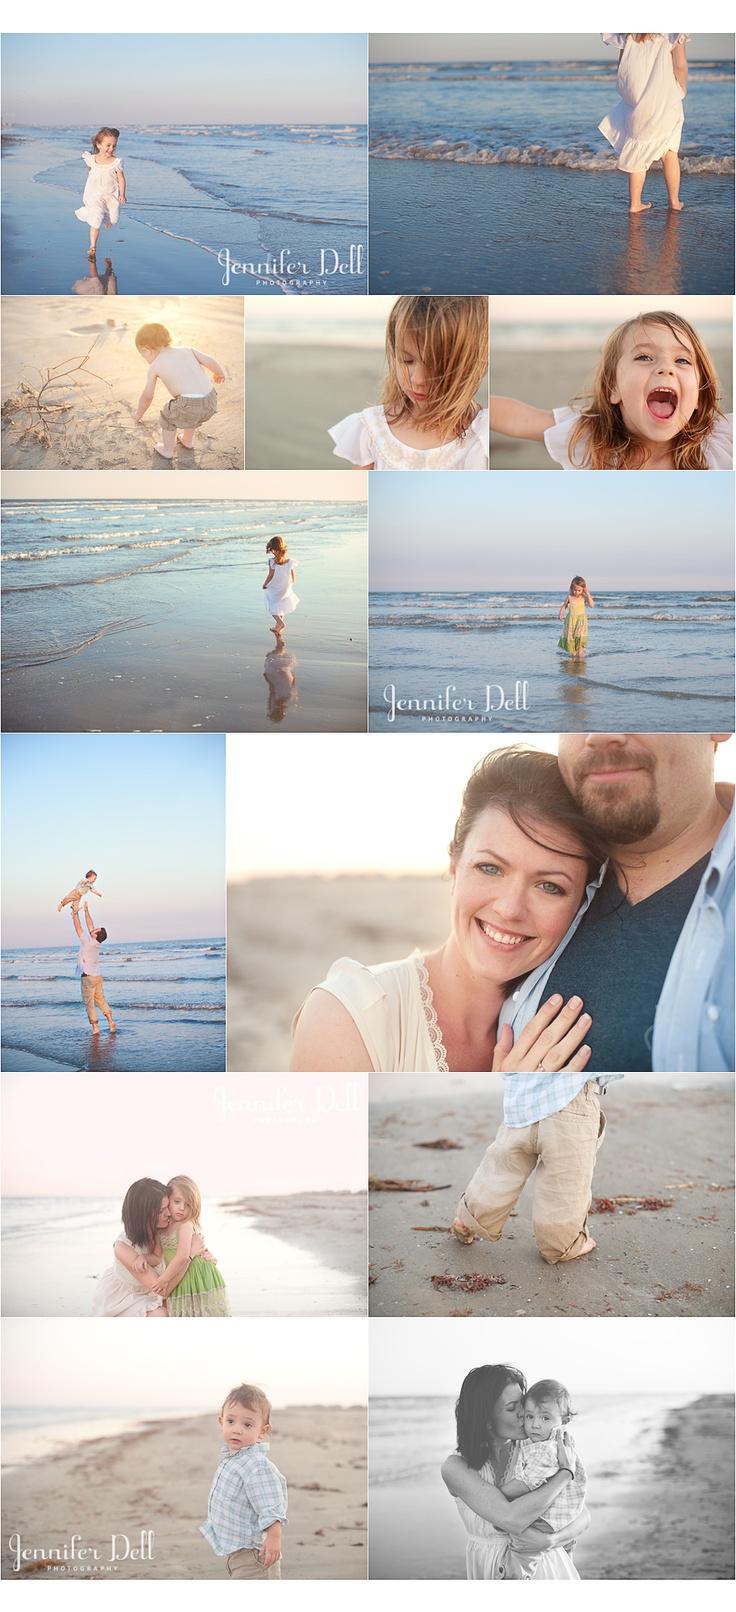 Amazing beach photos from Jennifer Dell